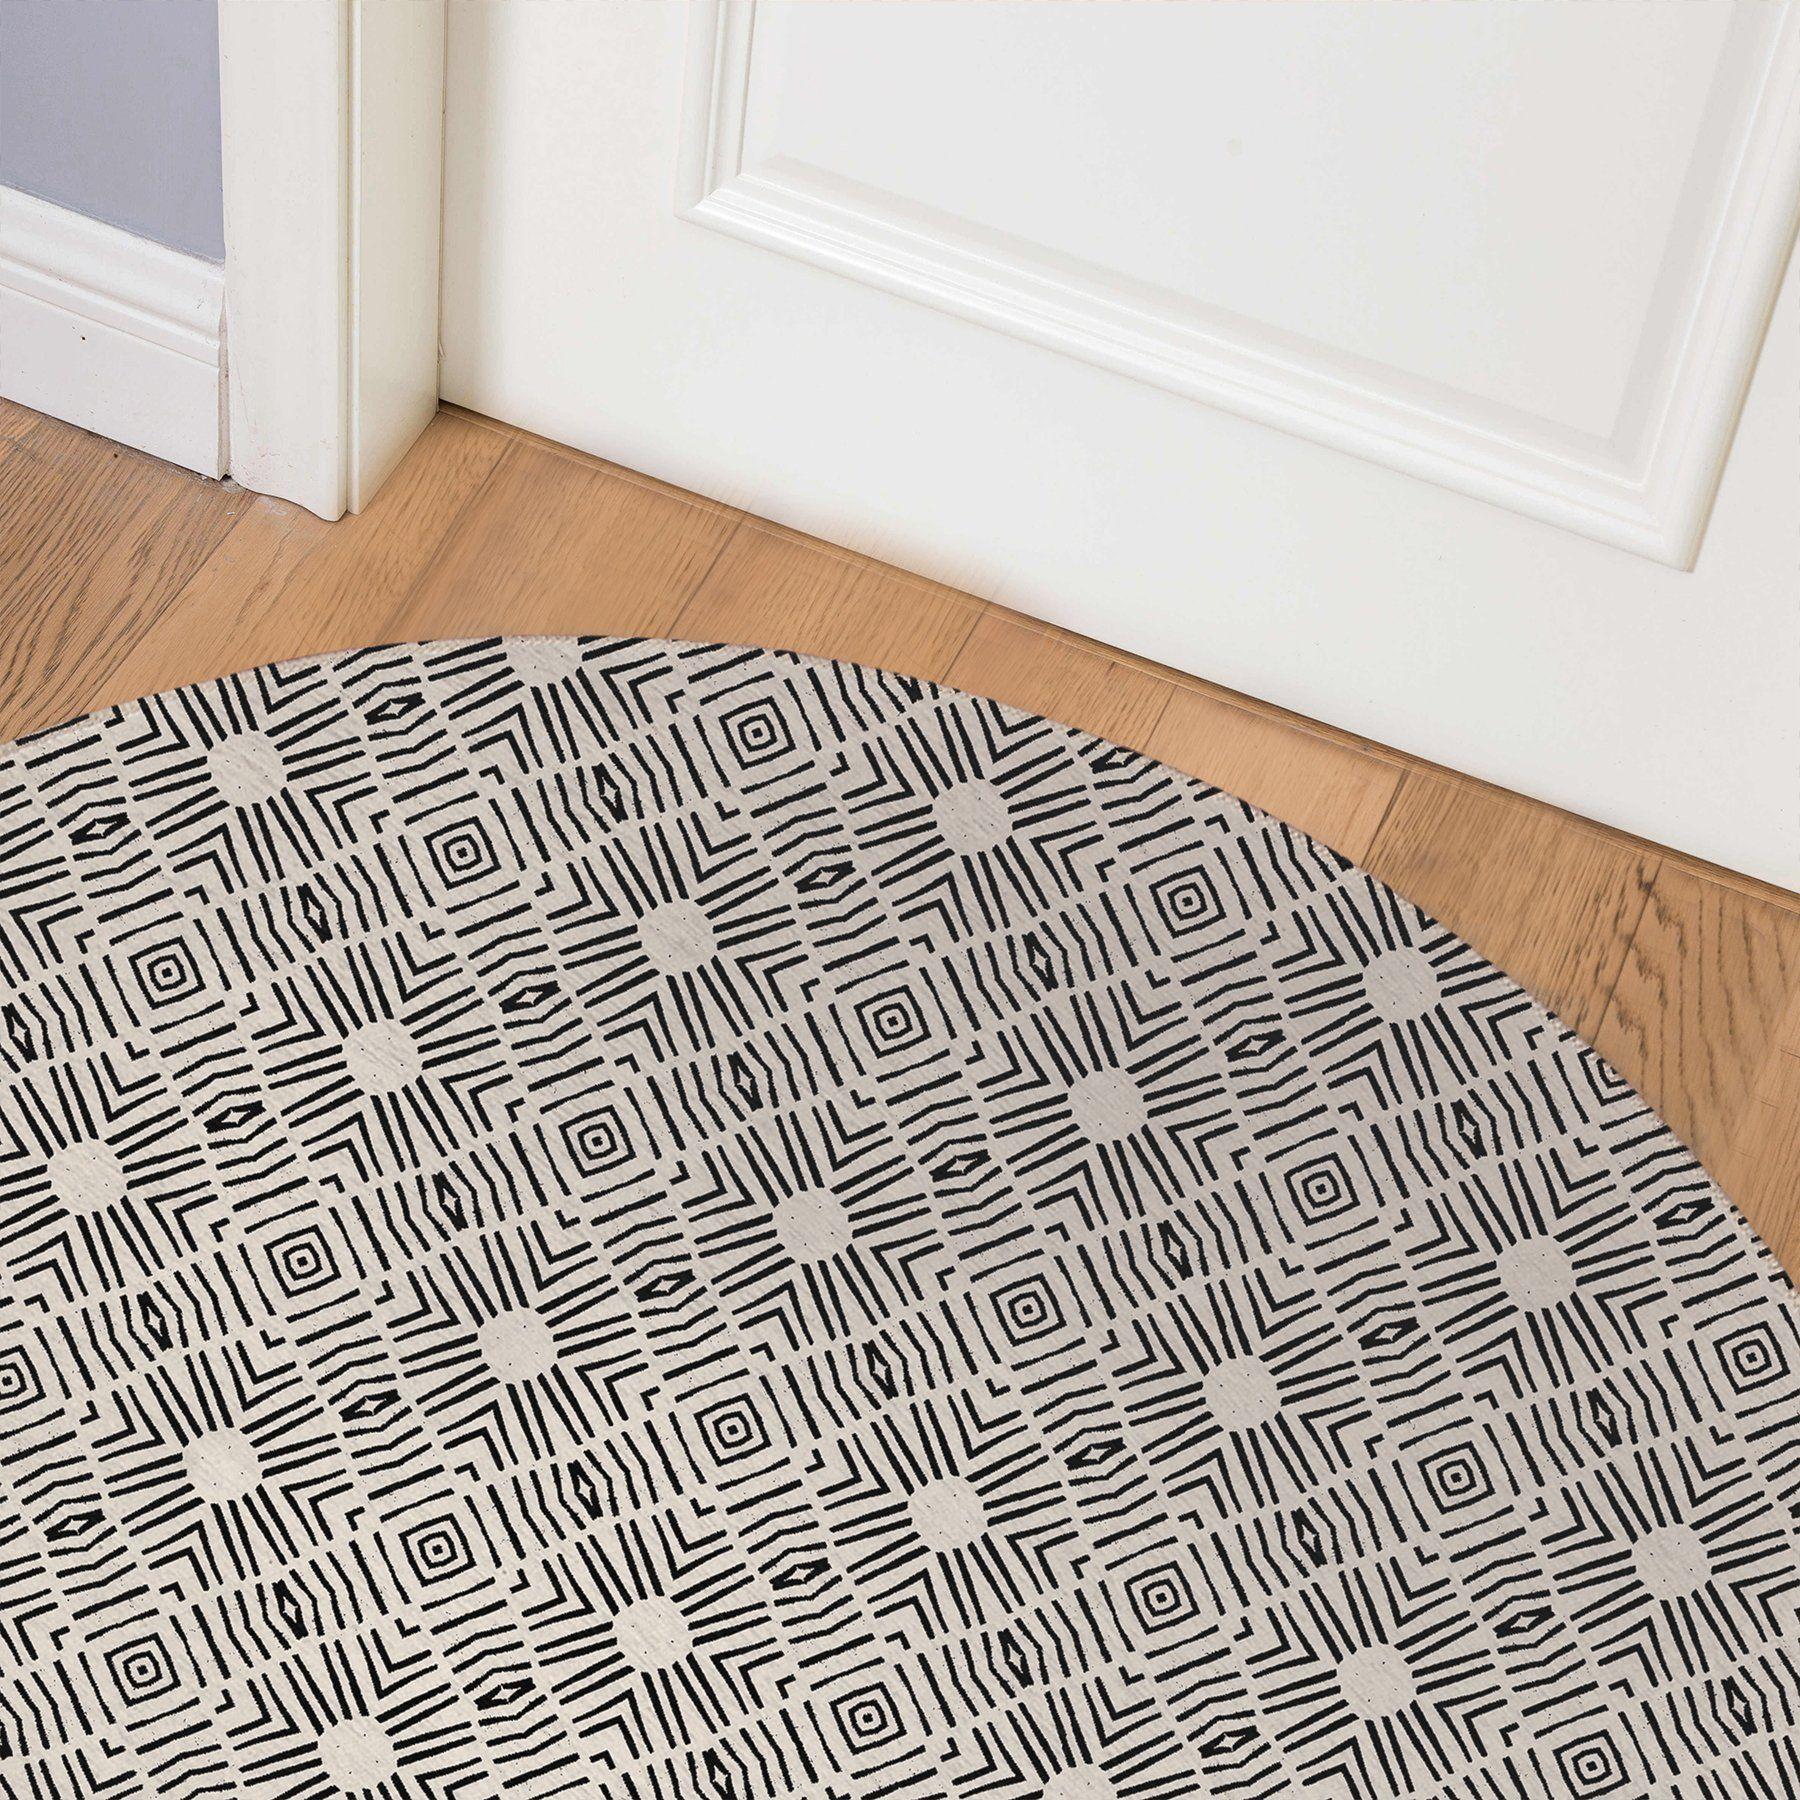 ADANA COLOR WAR Indoor Floor Mat By Michelle Parascandolo – Round 5ft x 5ft